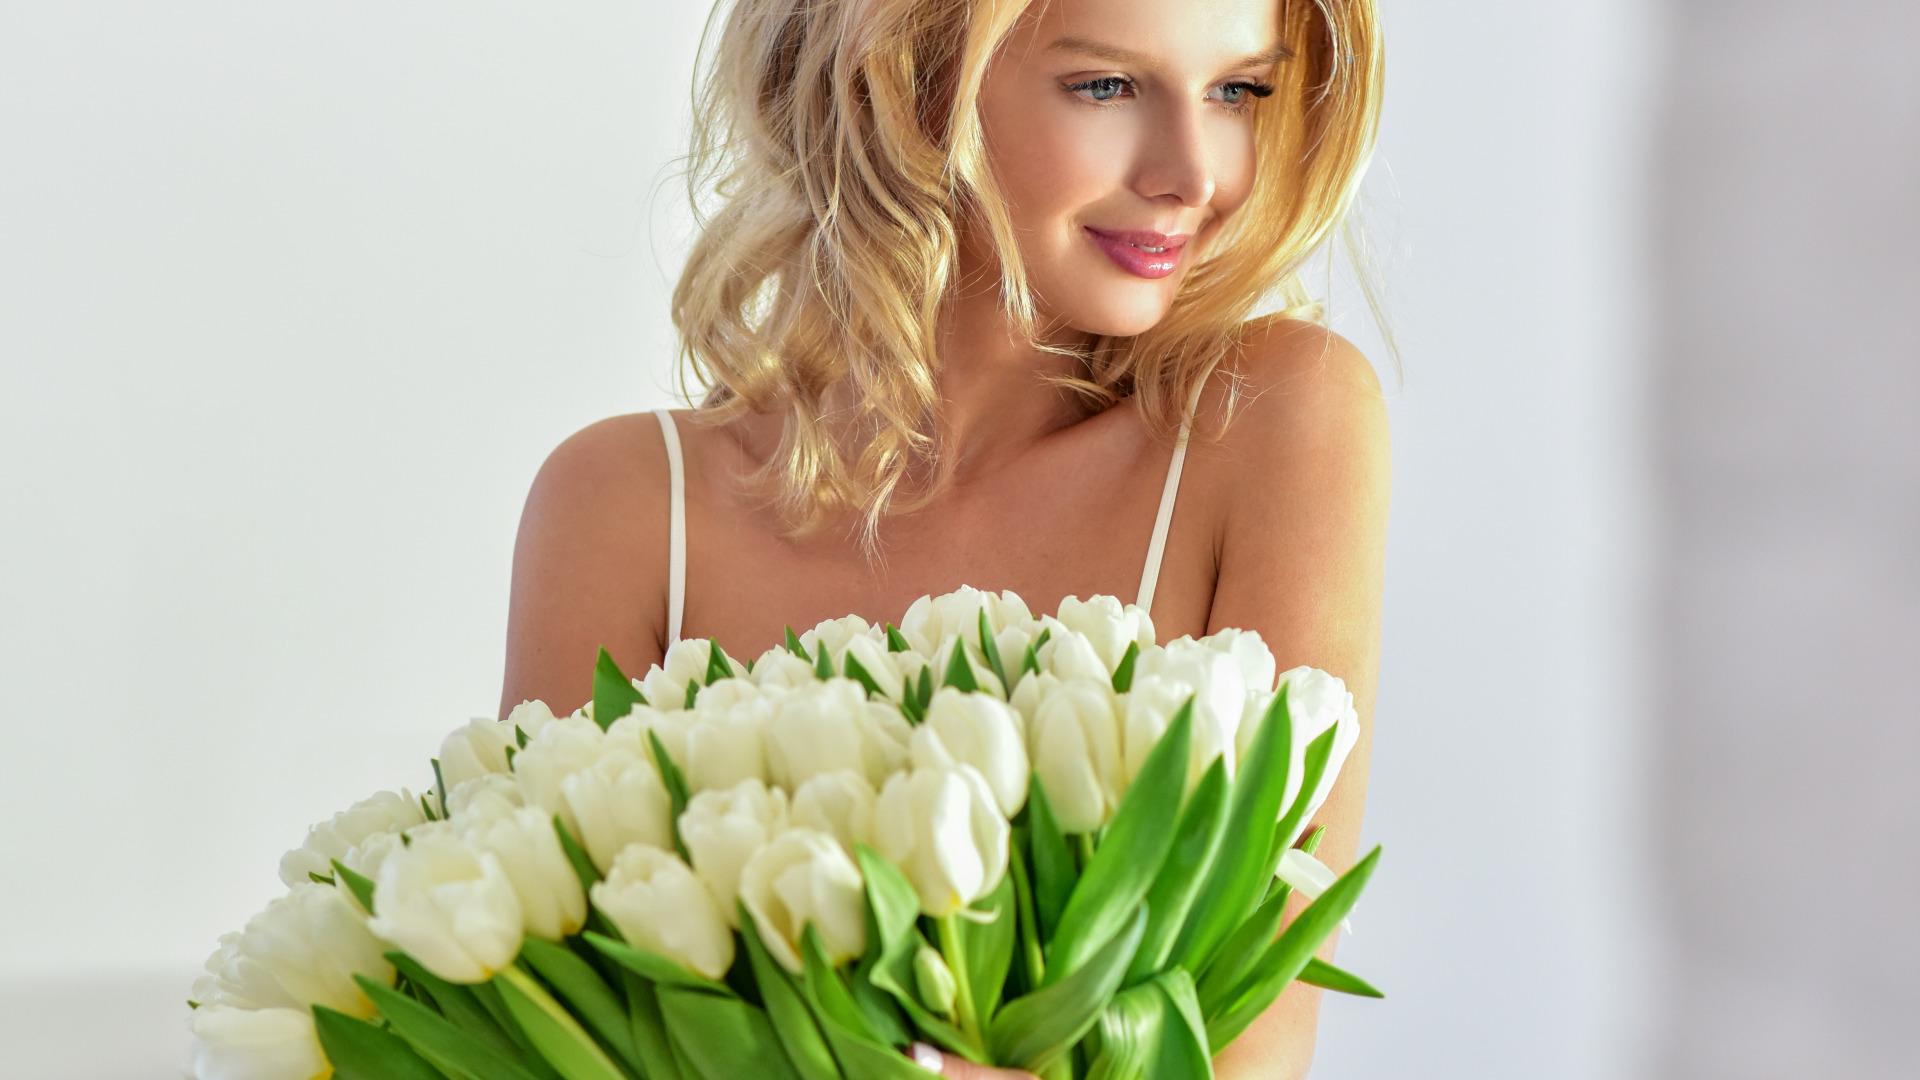 Картинки с цветами блондинок